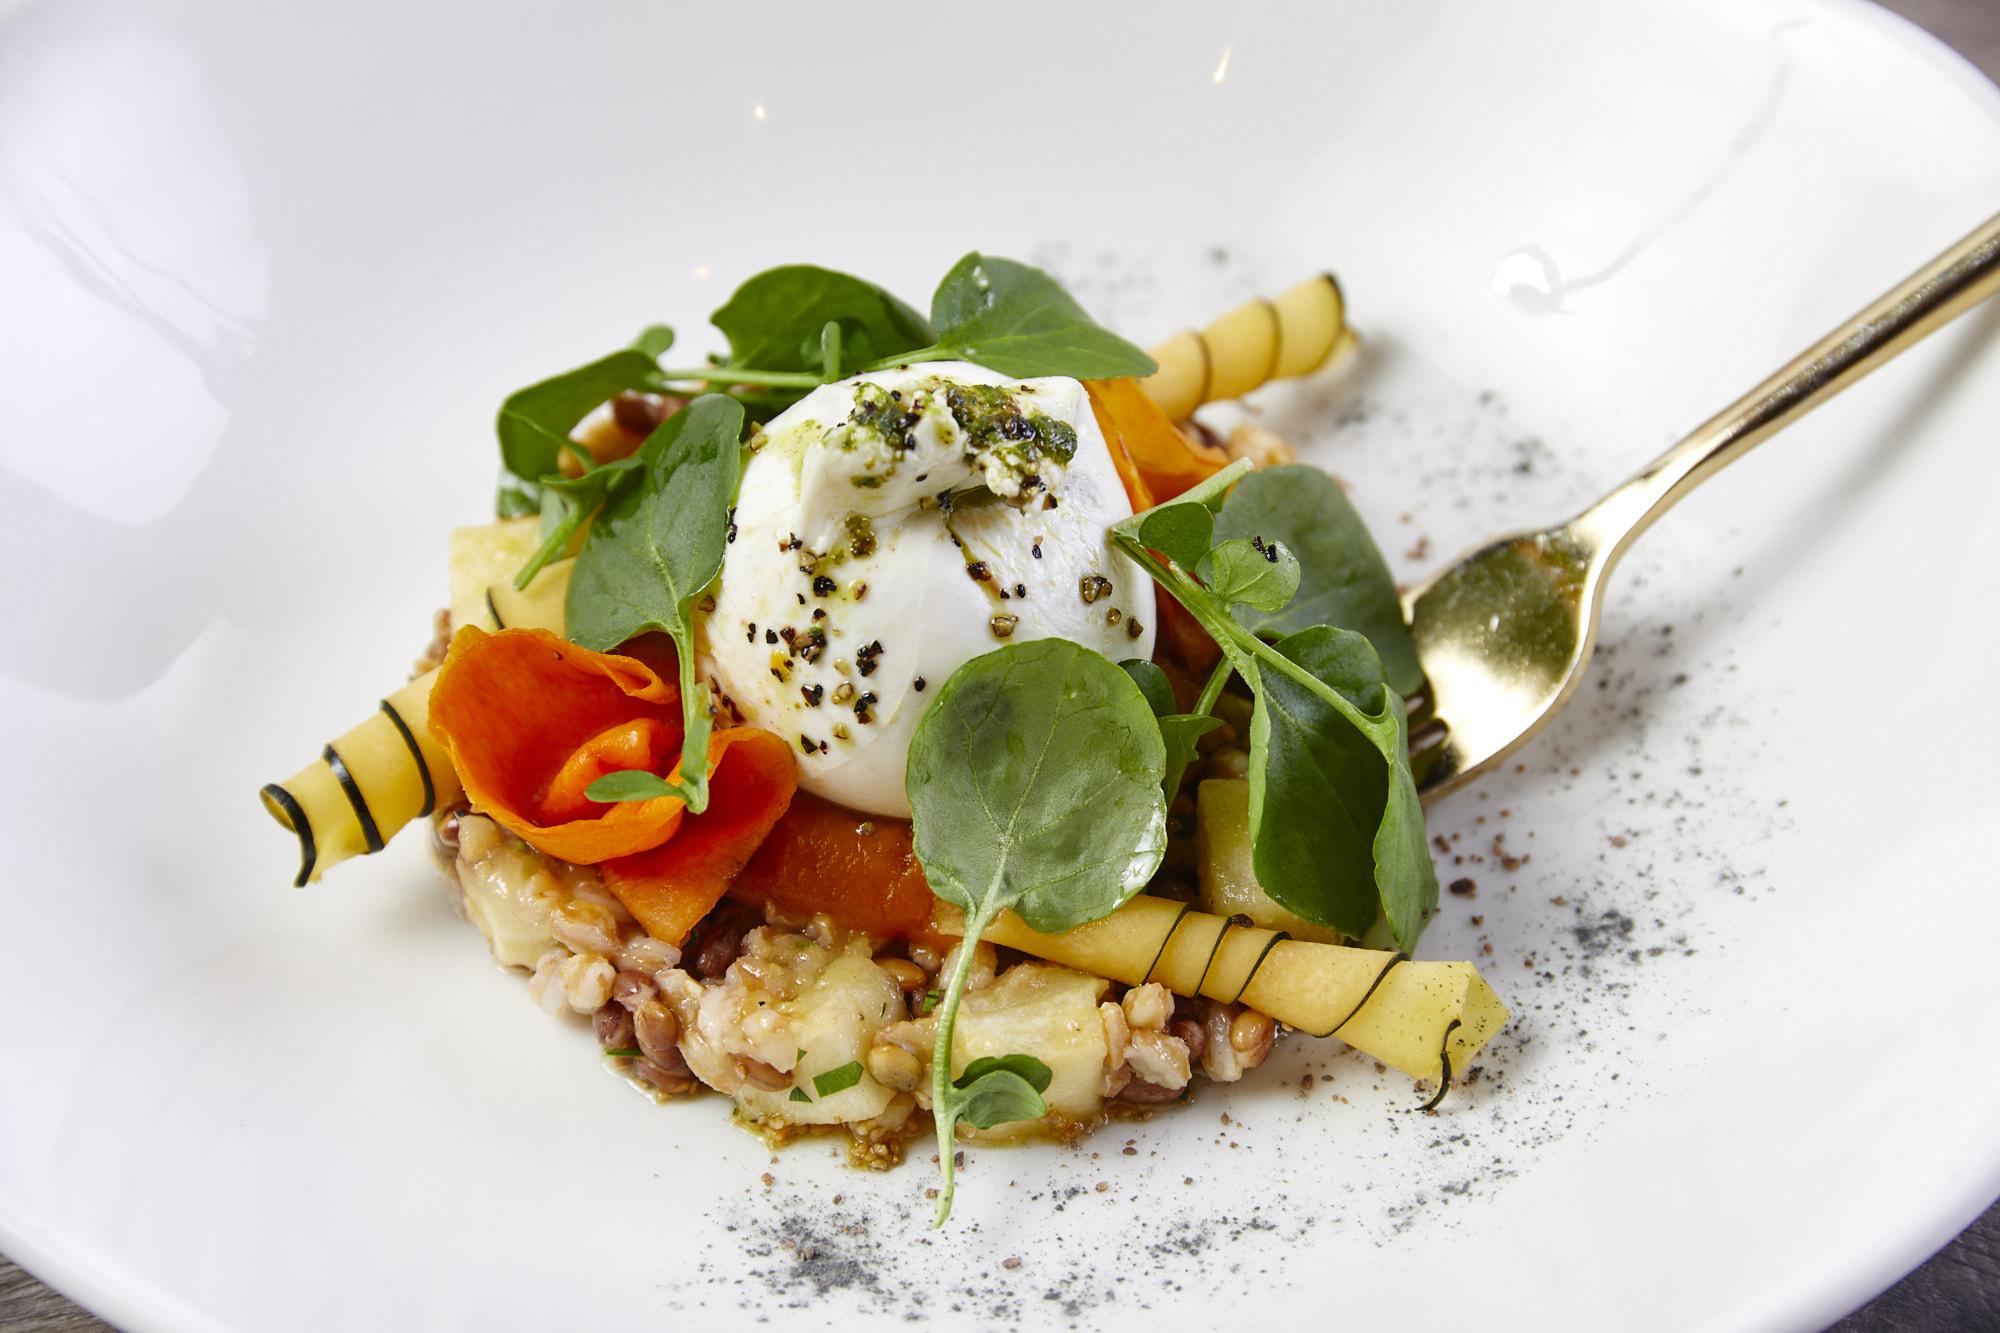 burrata and squash appetizer